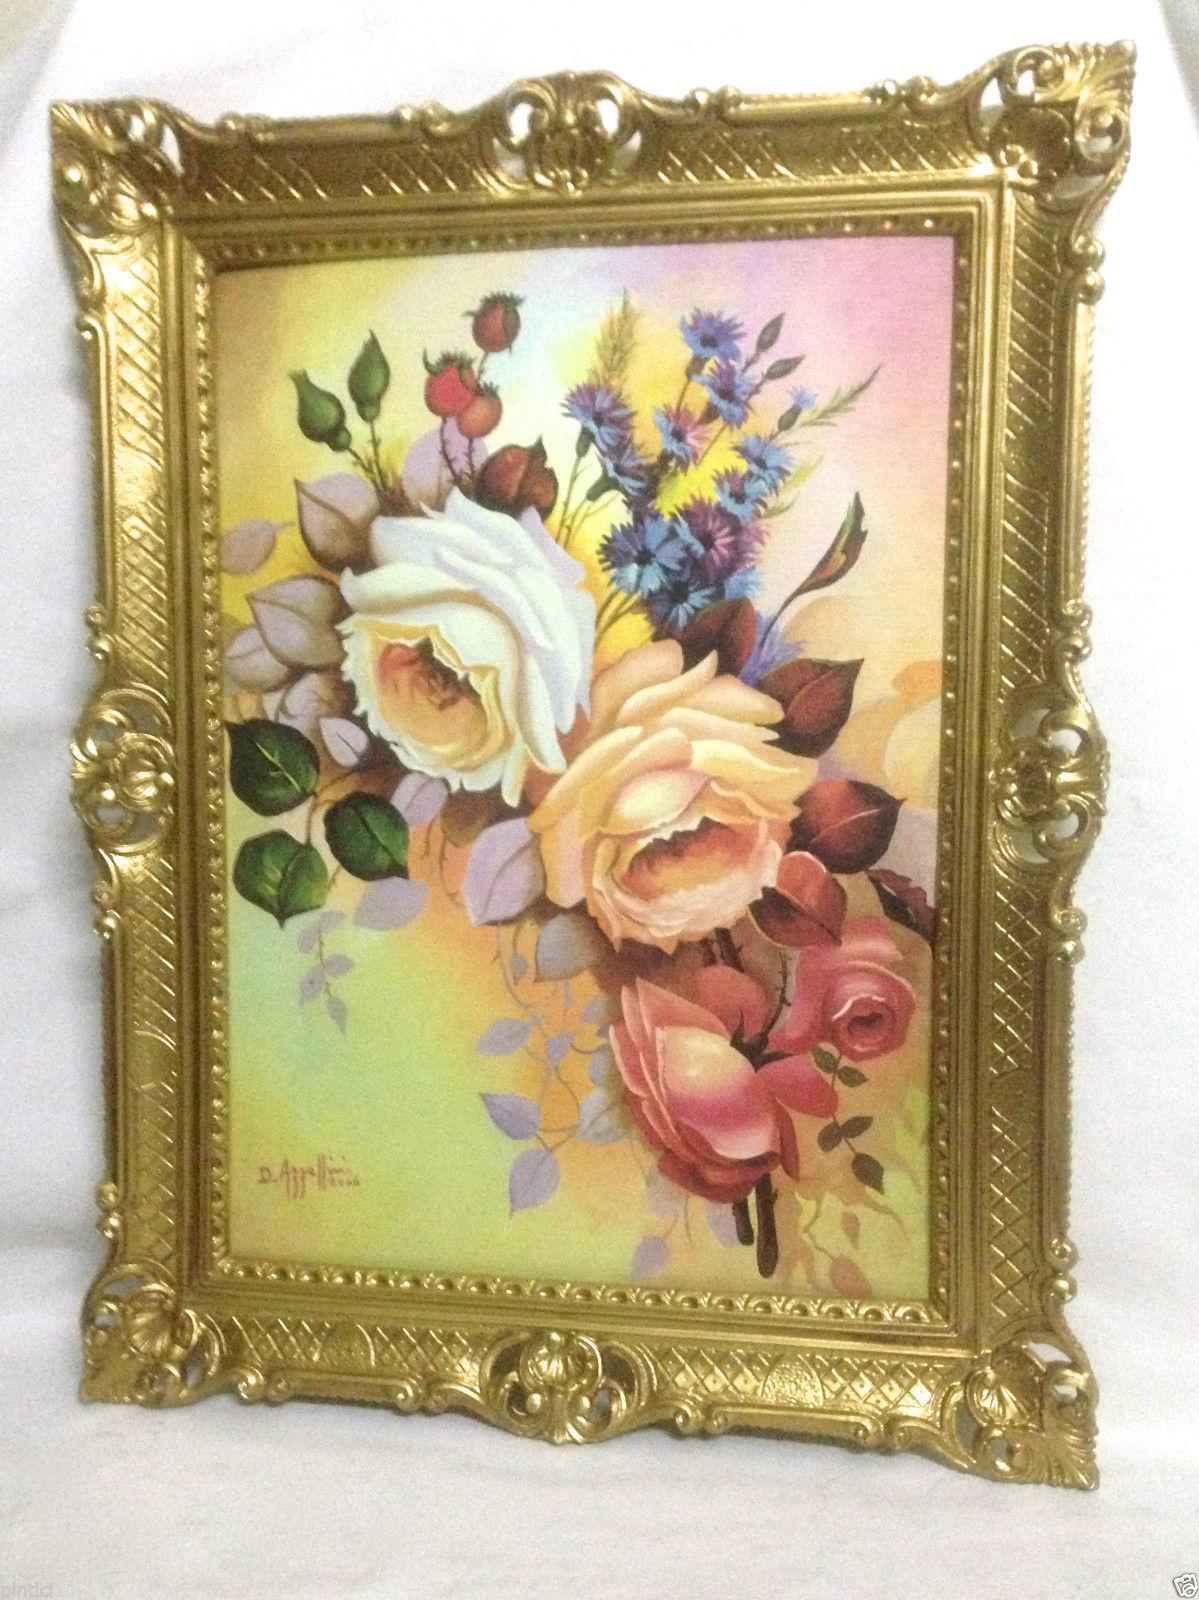 Gerahmte Gemälde Blumen Rosen Bild 90x70 Bilderrahmen Bild Mit ...